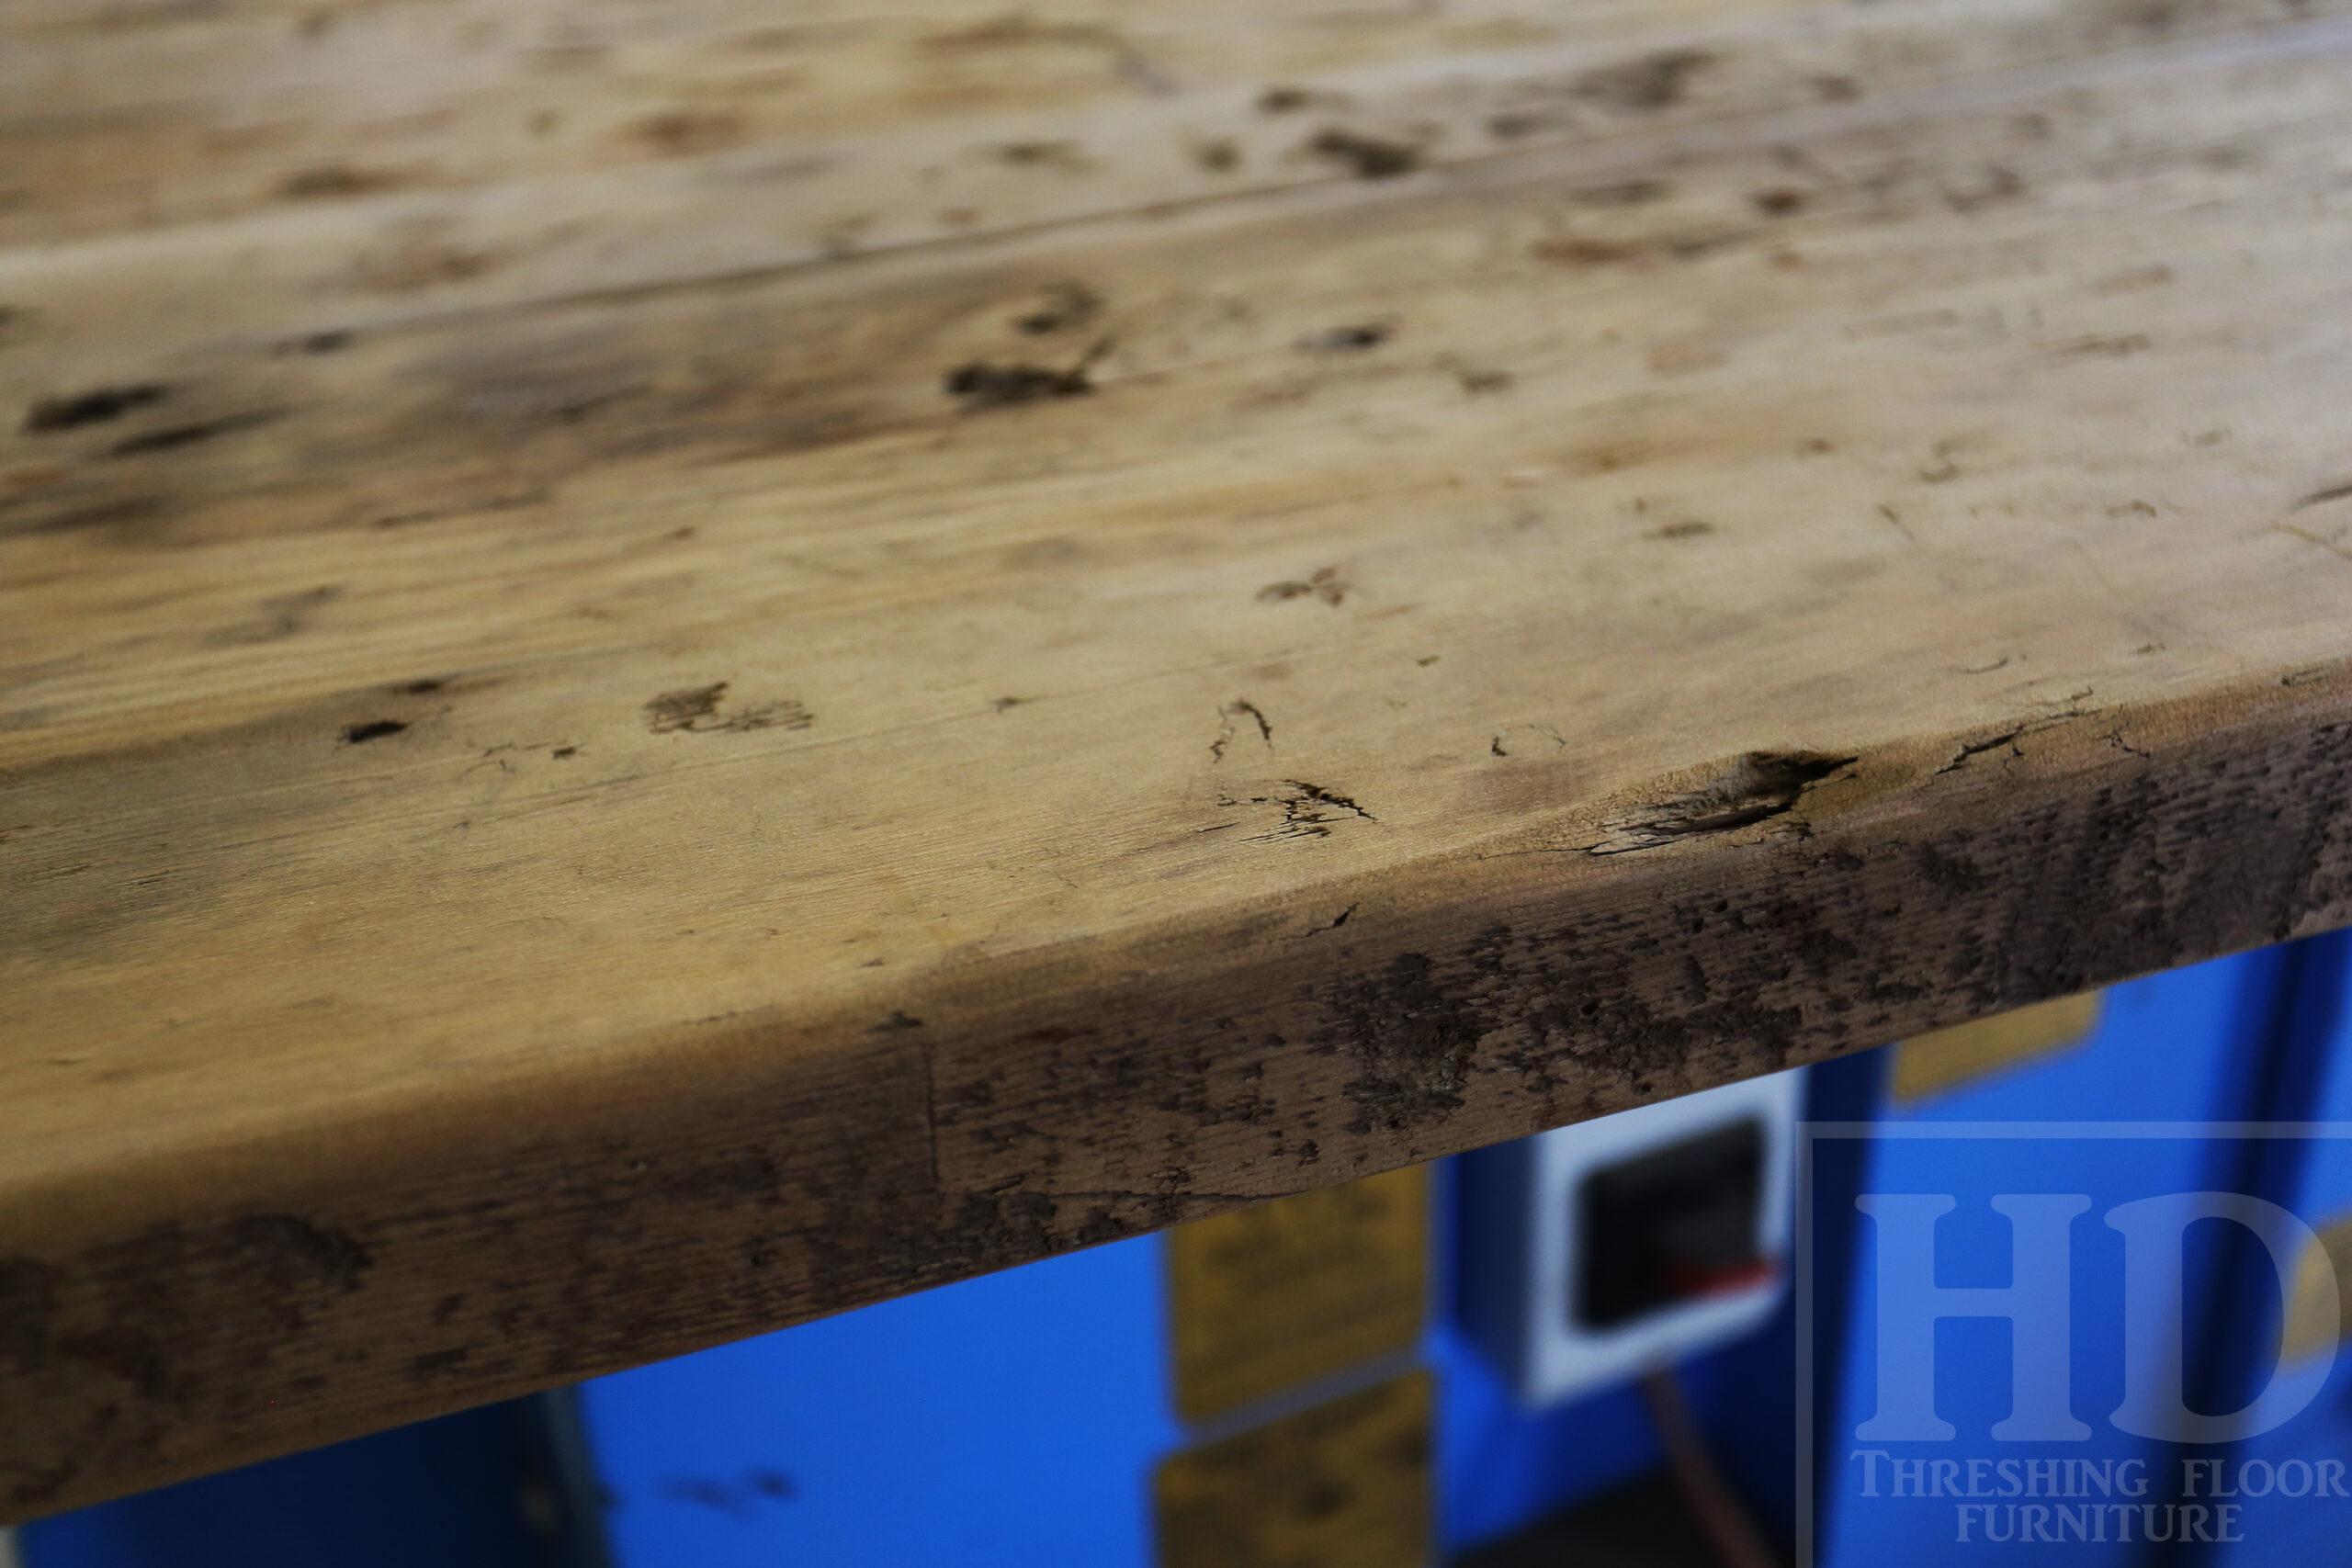 "Custom Reclaimed Wood Island Top we made for a Wasaga Beach, Ontario Home - 2"" Hemlock Threshing Floor Construction - Original Ontario barnwood edges & distressing maintained - Premium epoxy + satin polyurethane finish - www.table.ca"